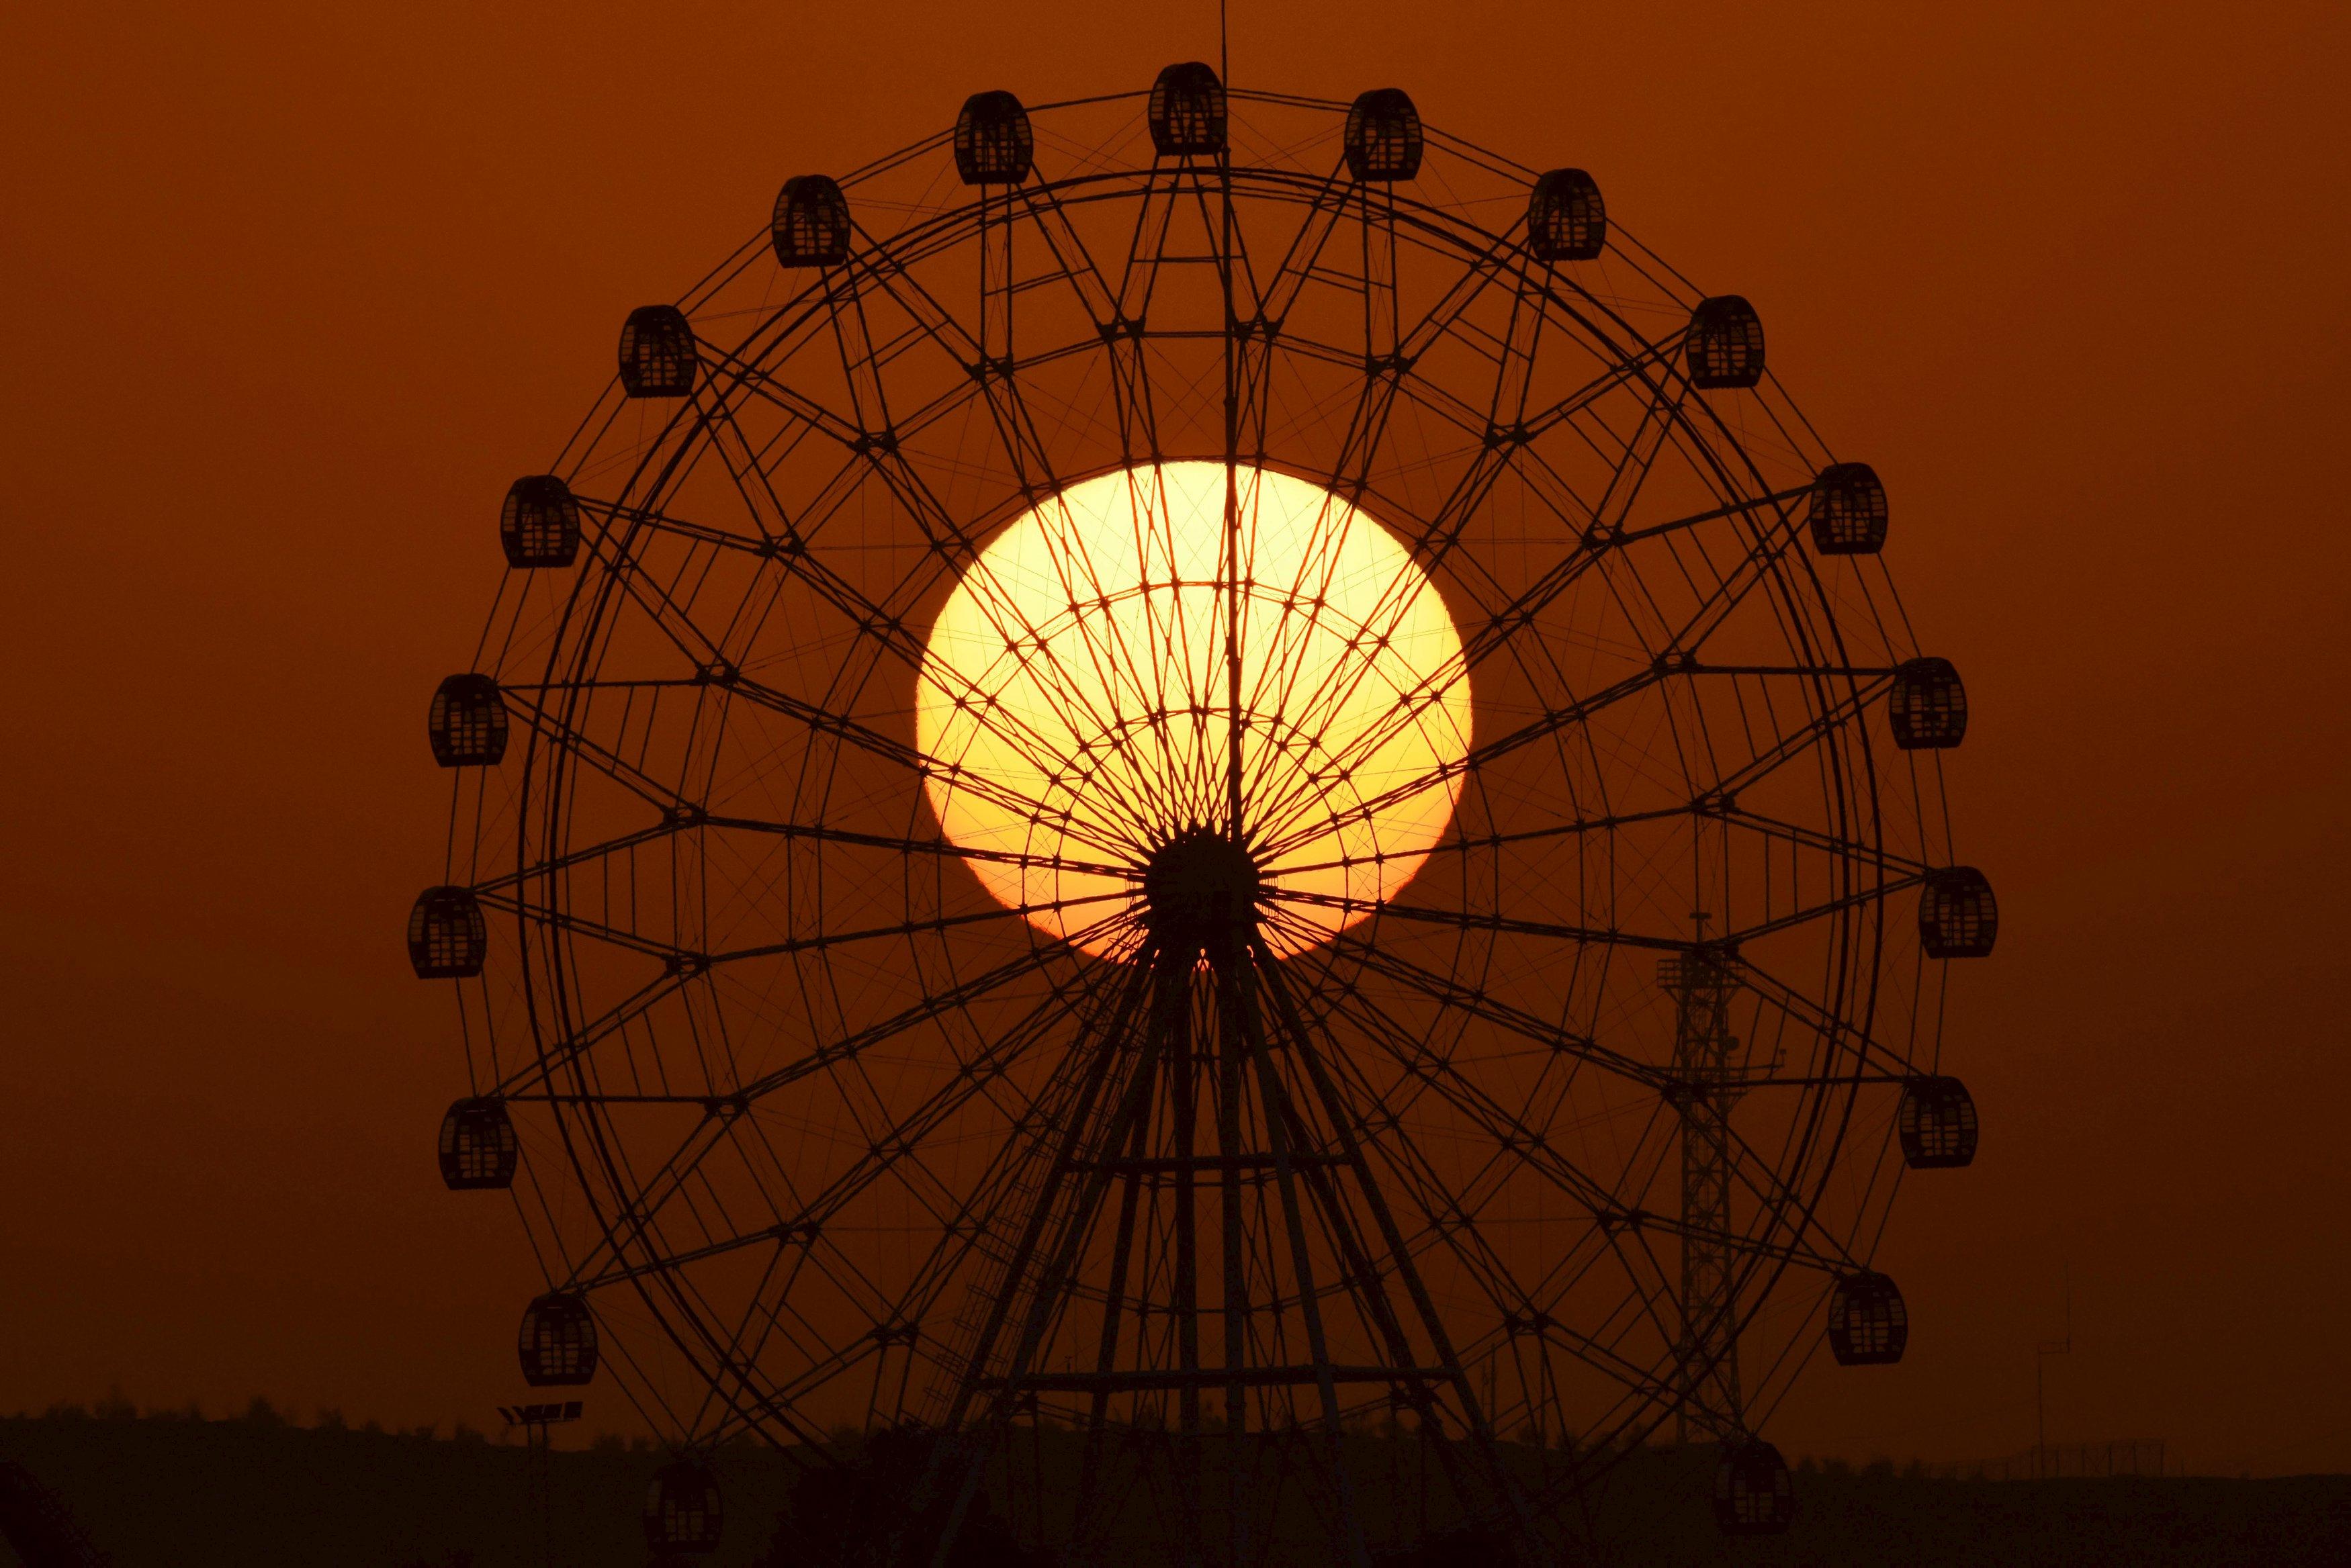 Matahari terbit terlihat di belakang bianglala di Korla, Wilayah Otonomi Xinjiang Uighur, Selasa (10/11). REUTERS/China Daily.